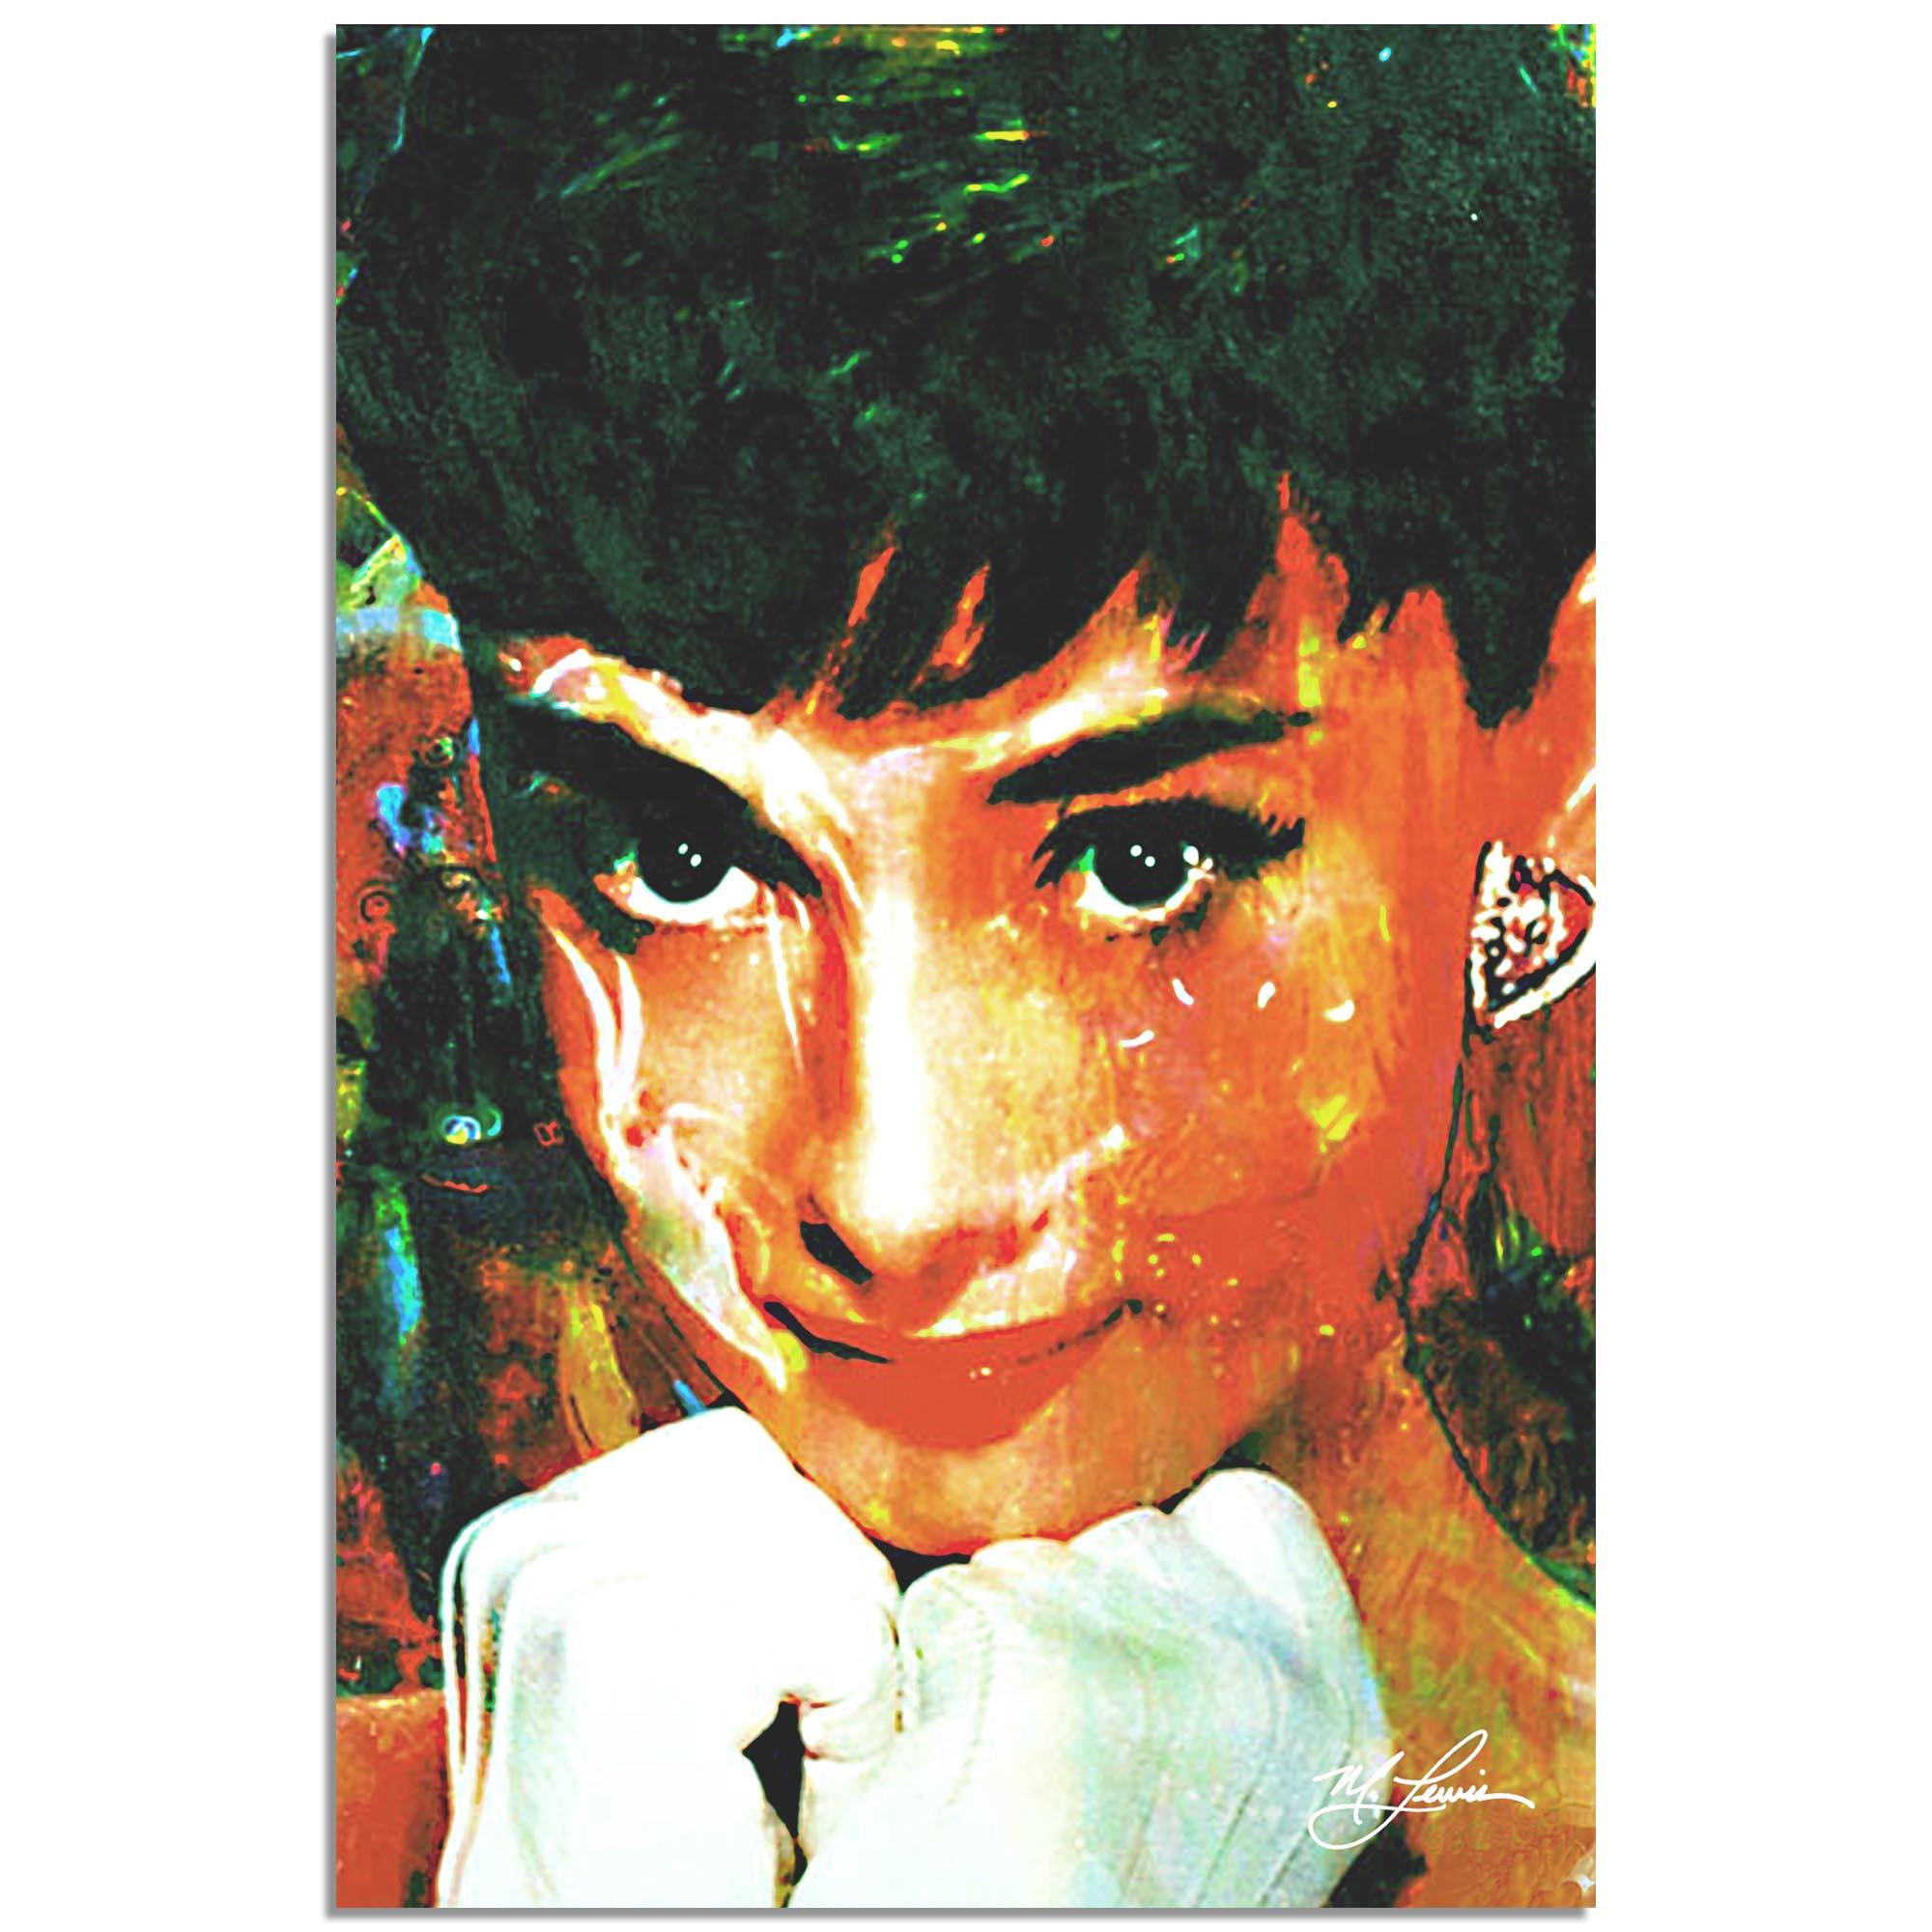 Mark Lewis 'Audrey Hepburn Tiffany Delight' 22in x 32in Celebrity Pop Art on Metal or Plexiglass